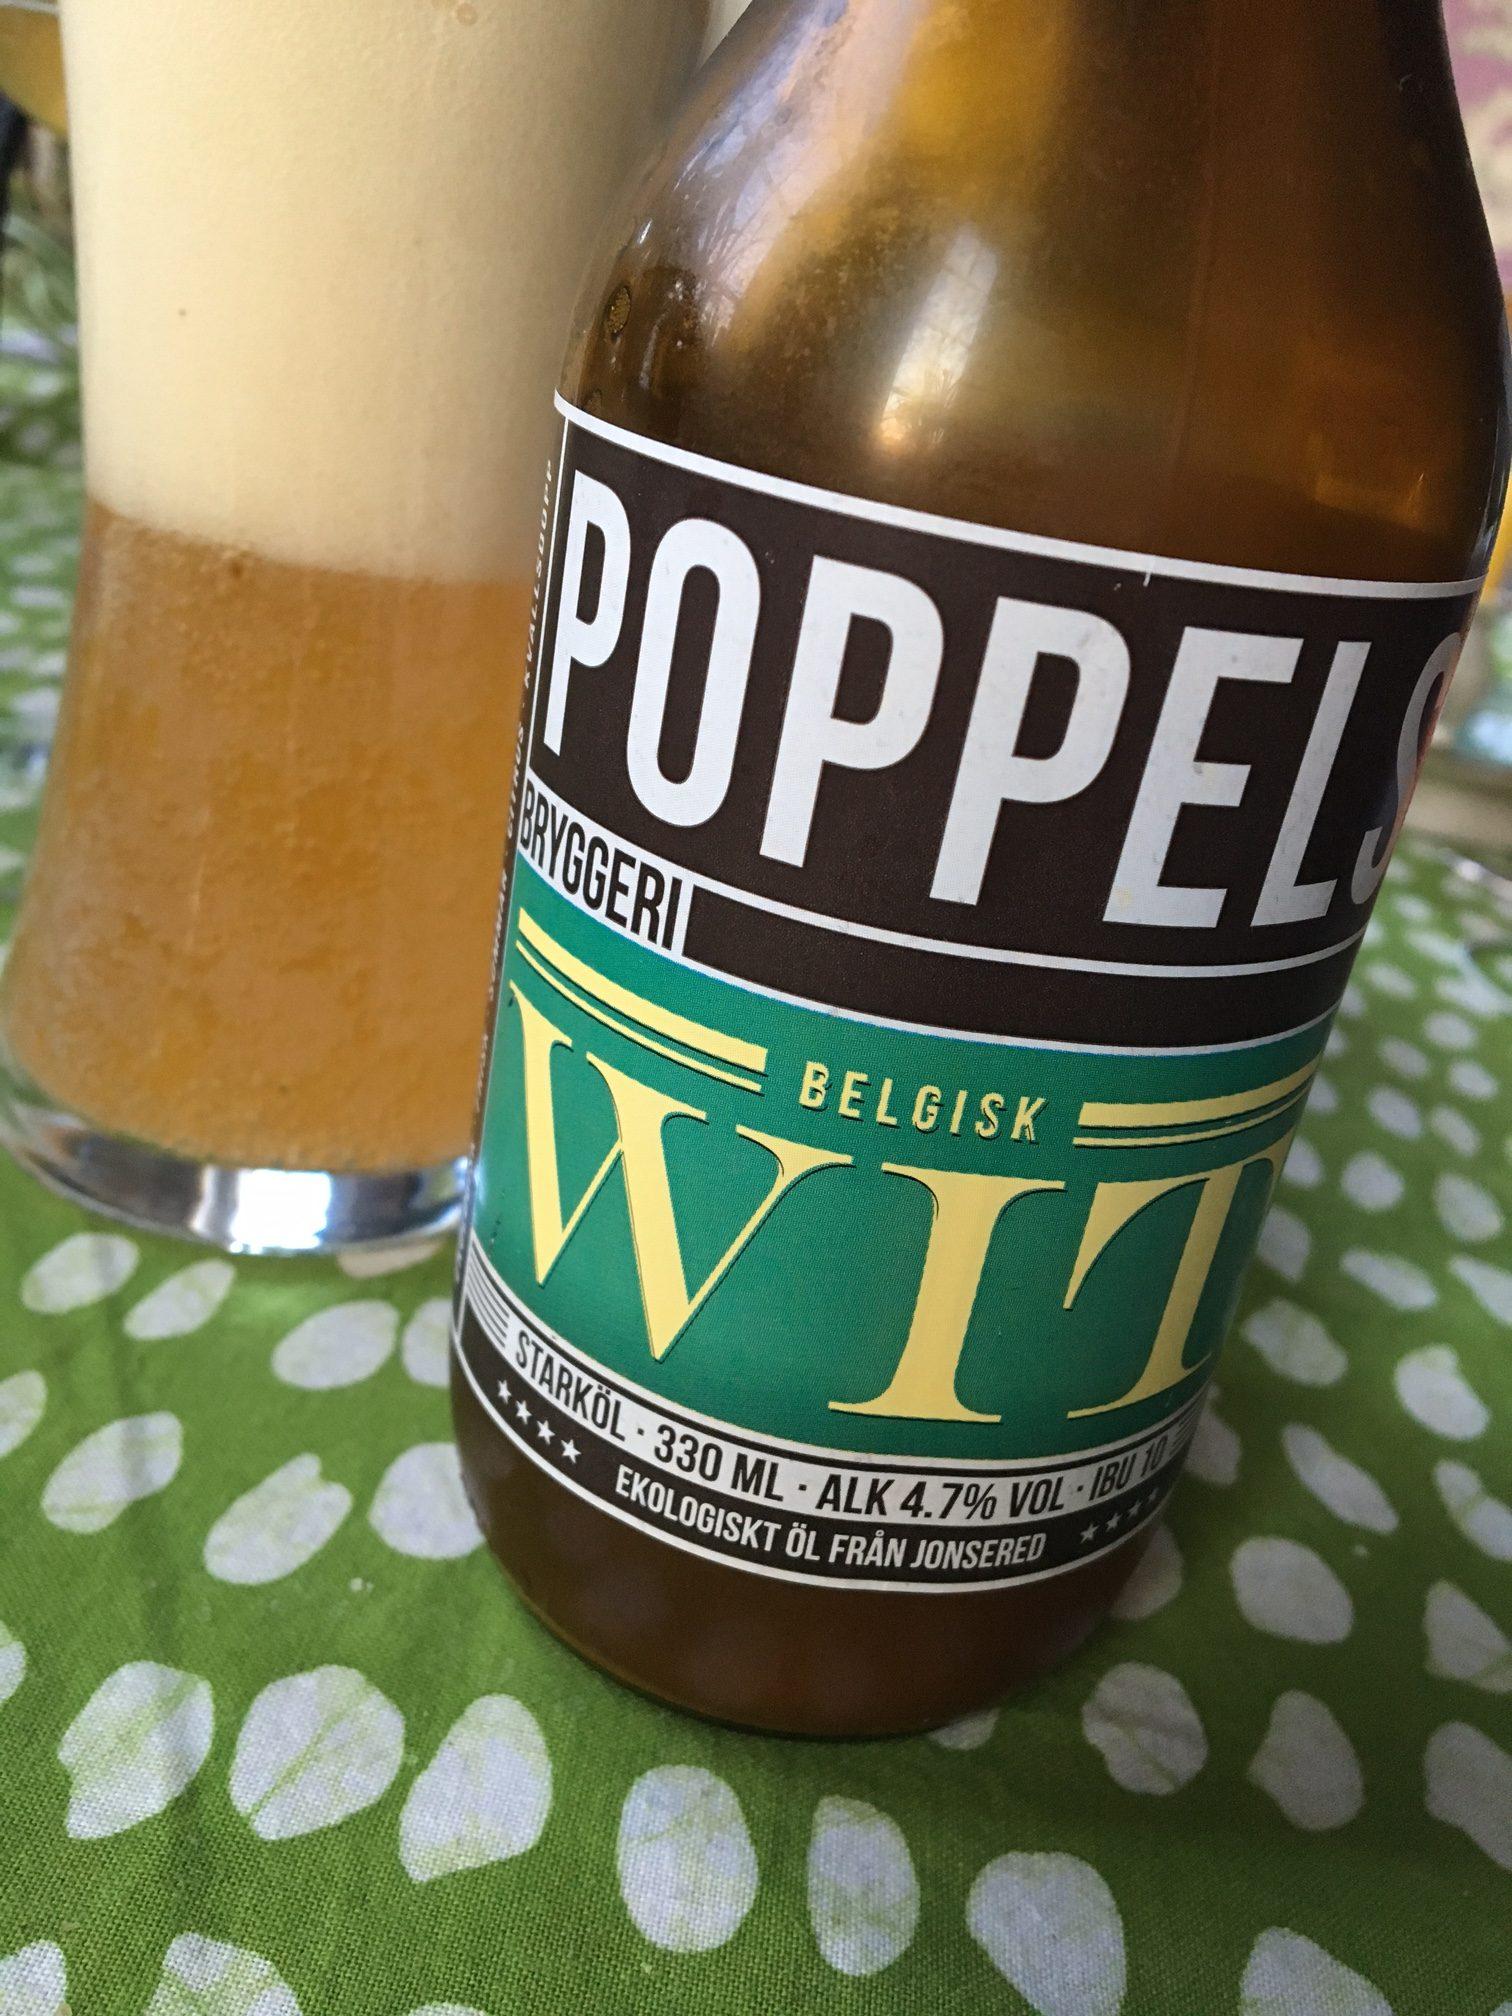 Poppels belgisk wit från Poppels bryggeri.